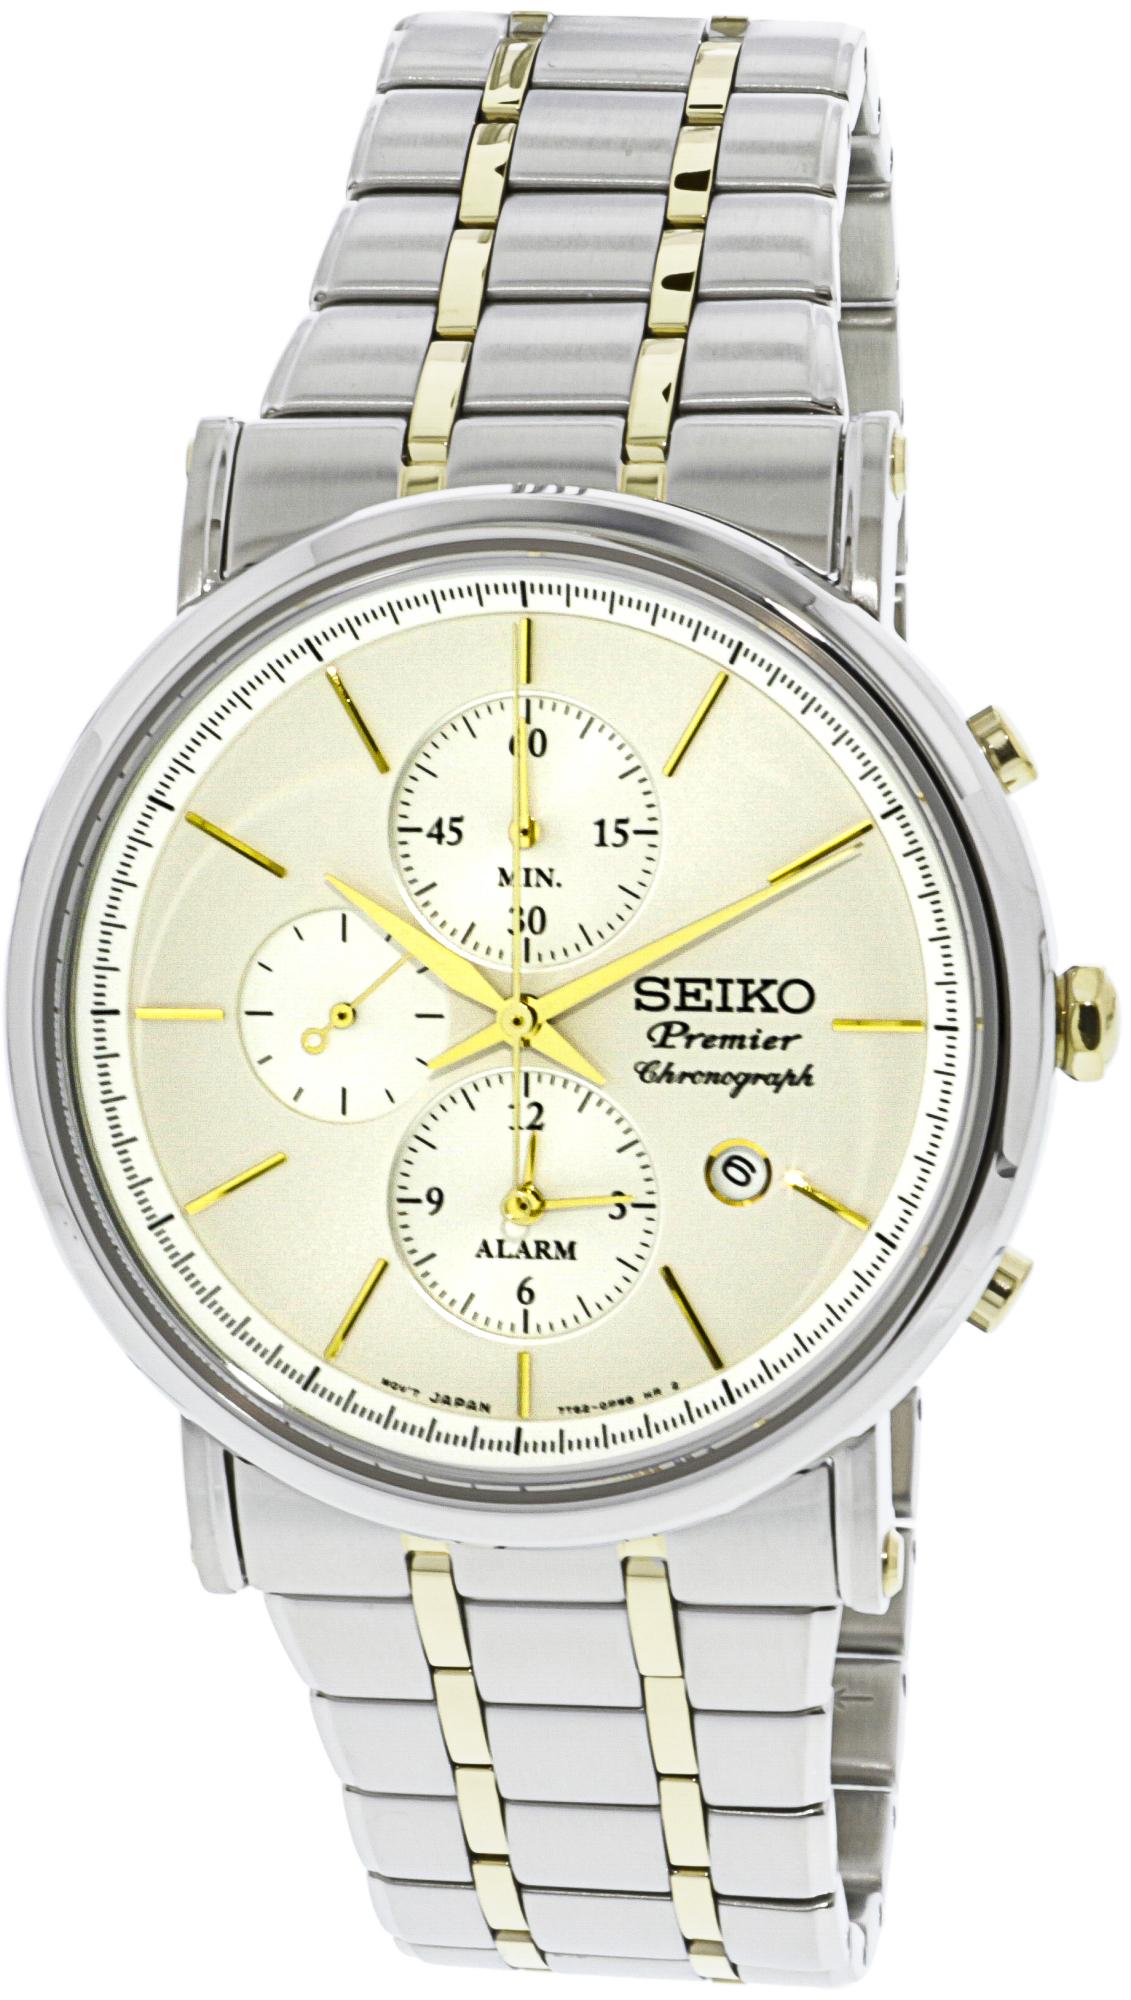 Seiko_Men's_SNAF80_Silver_Stainless-Steel_Japanese_Quartz_Fashion_Watch